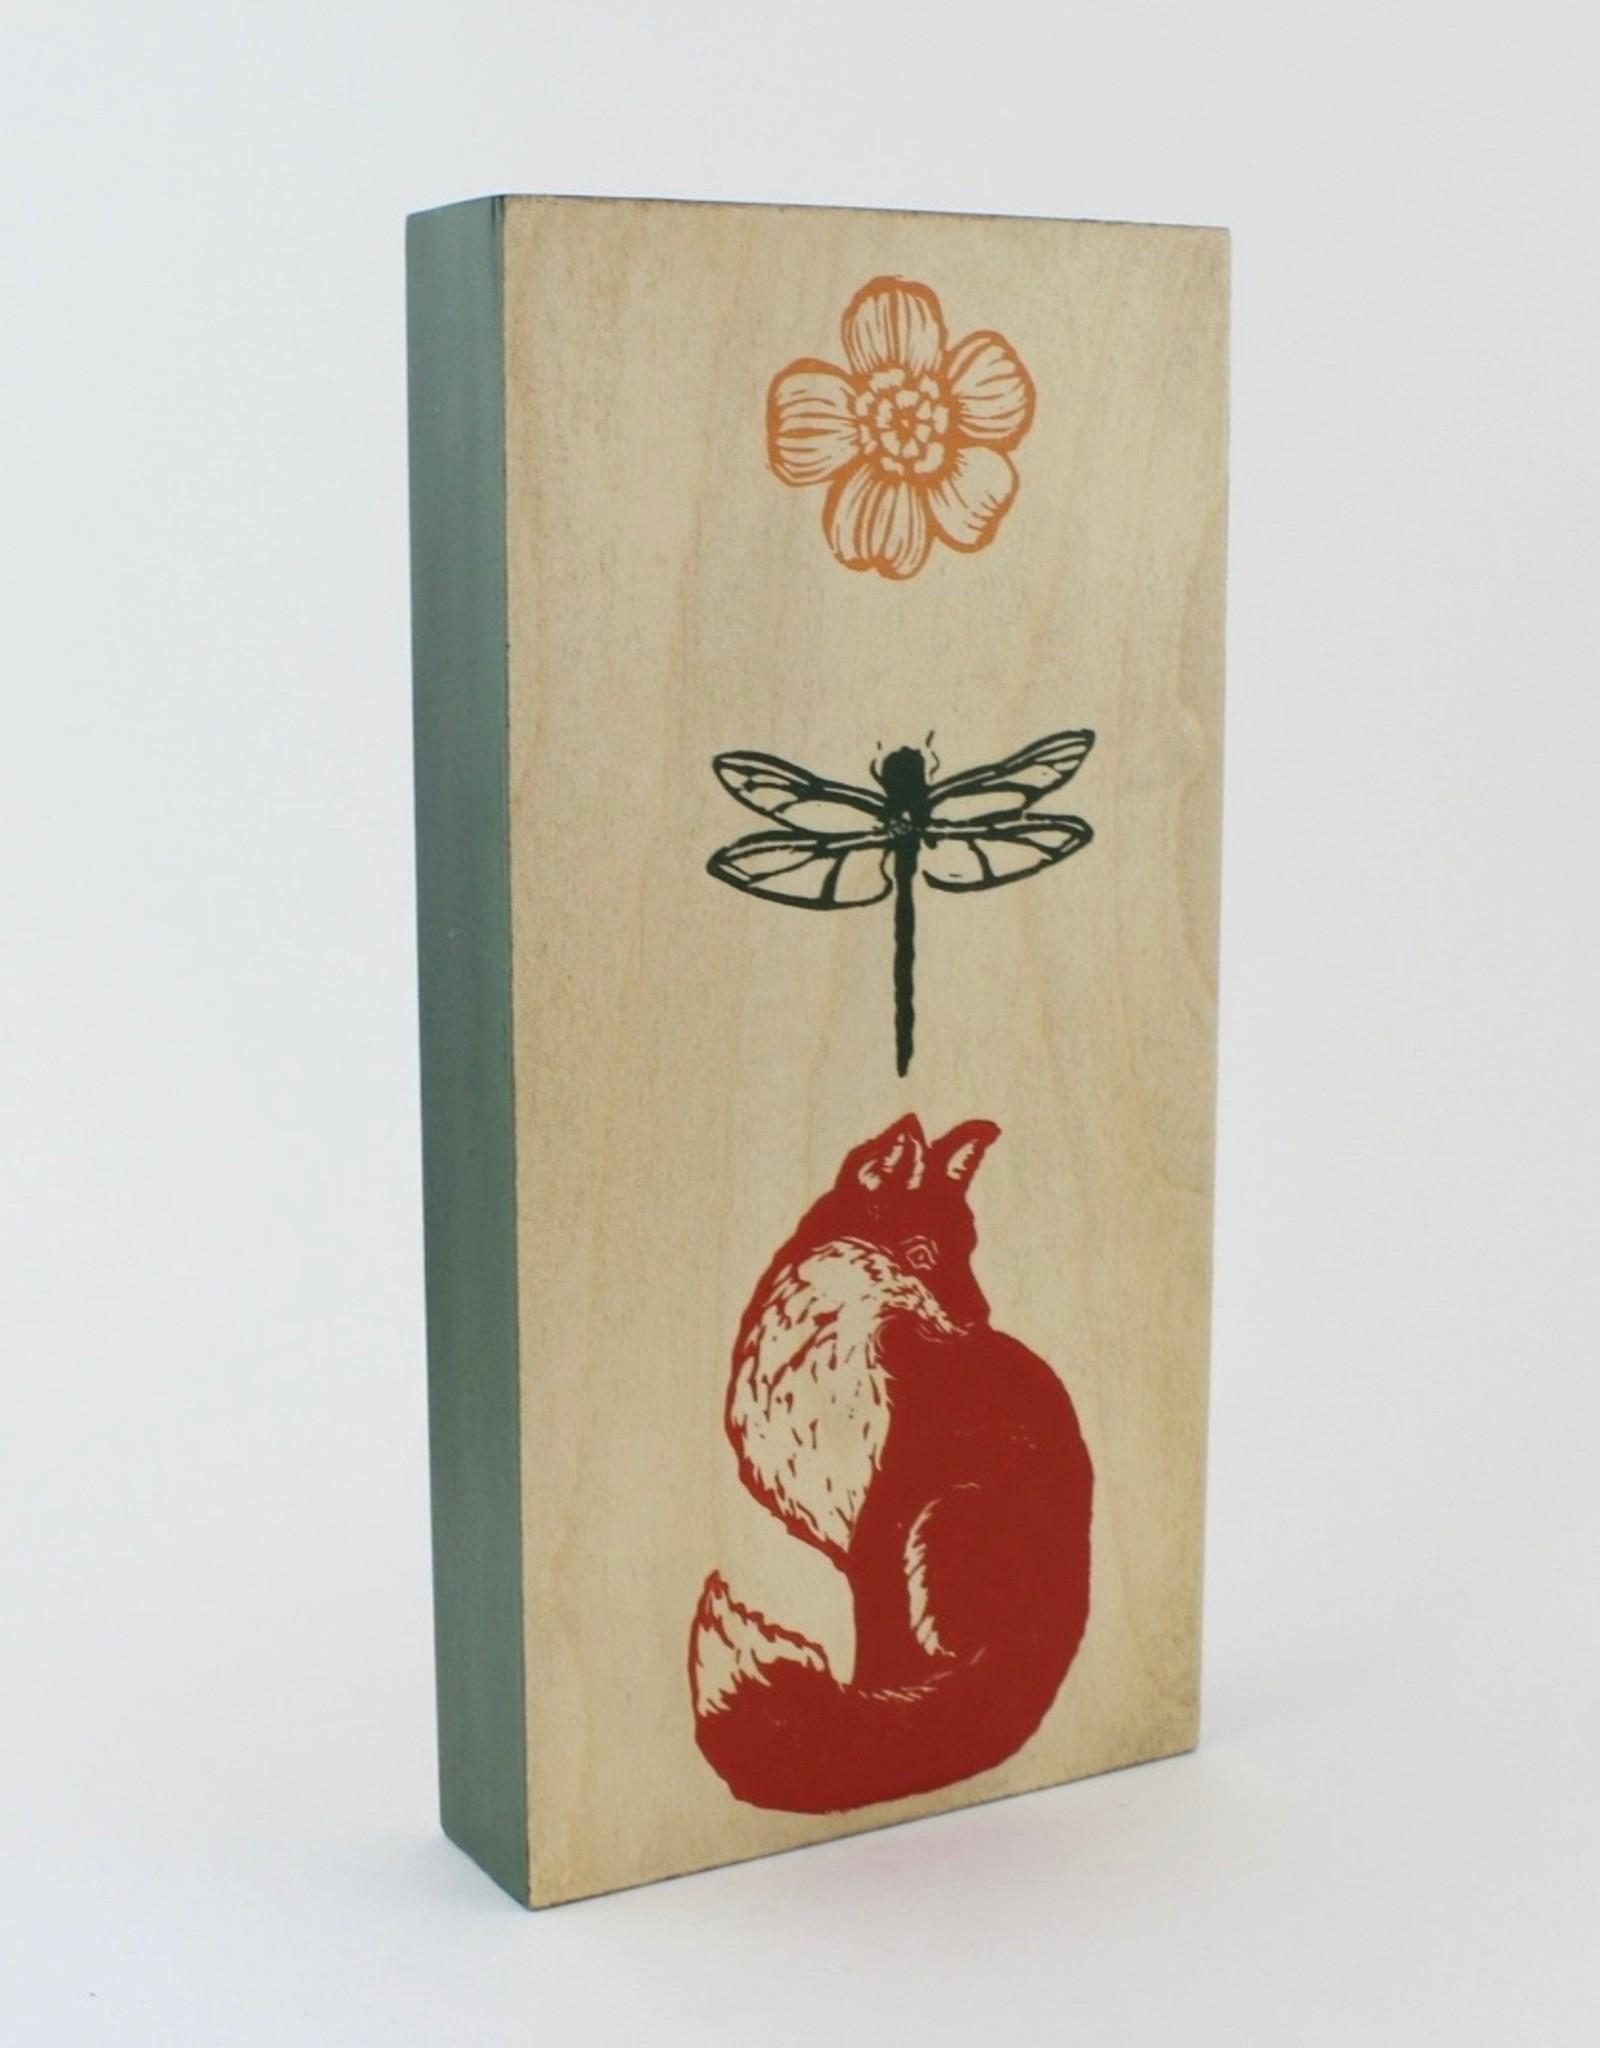 Cabot & Rose Animal Block Print on Wood Panel by Cabot & Rose